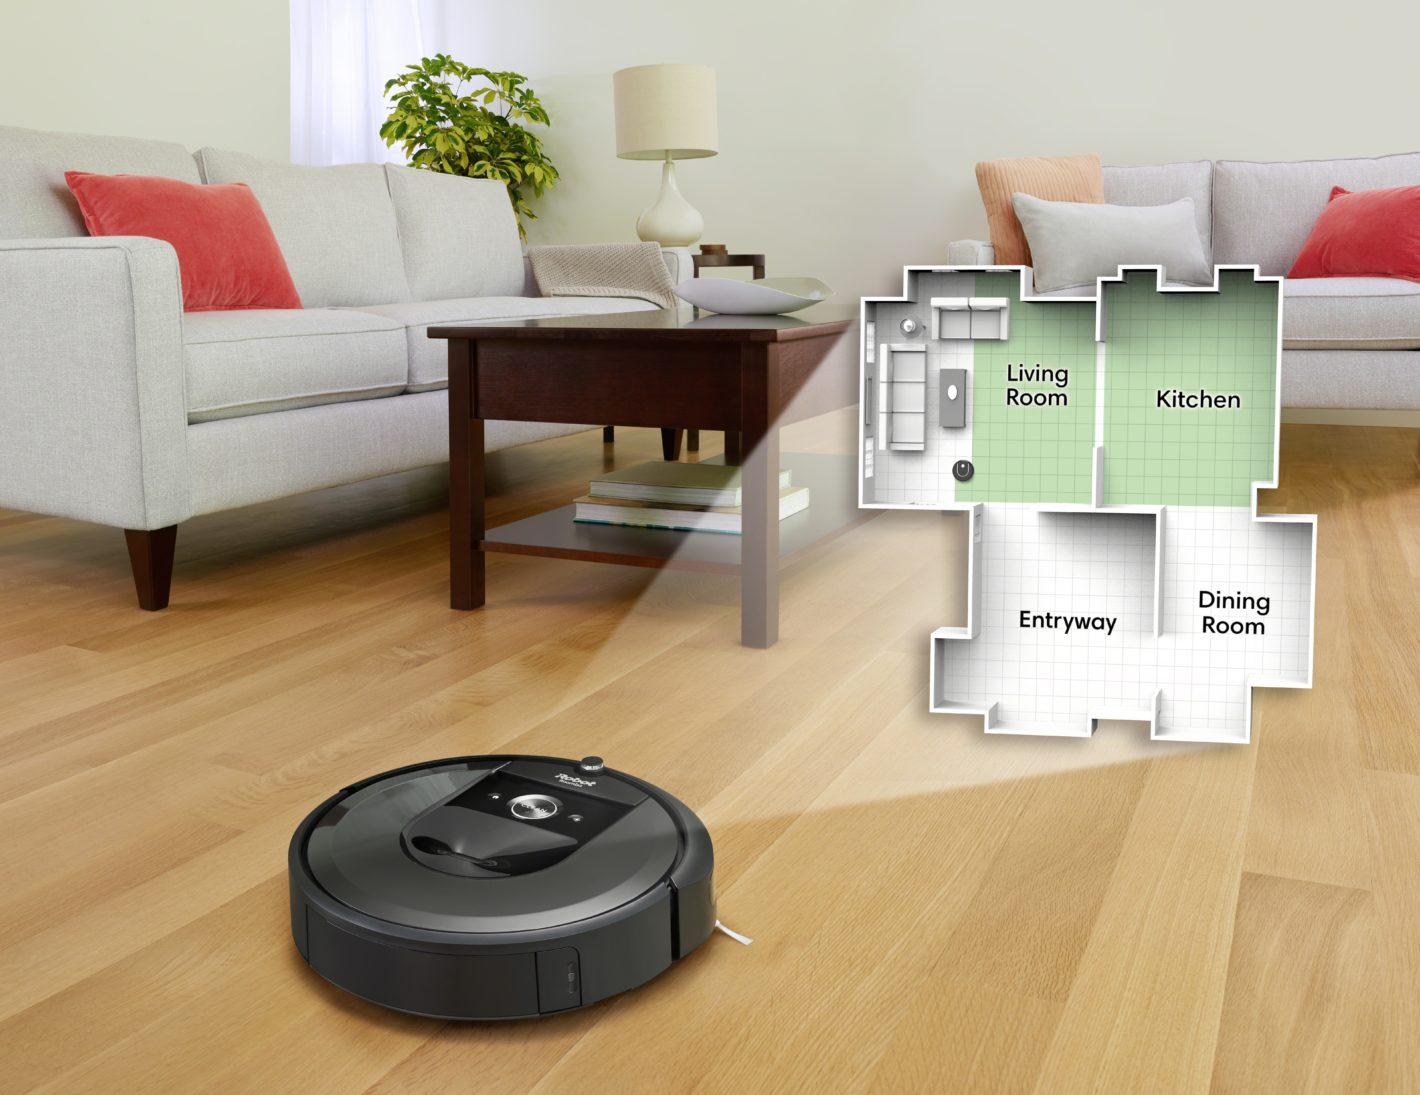 59054 Save $200 On The iRobot Roomba i7 Robot Vacuum